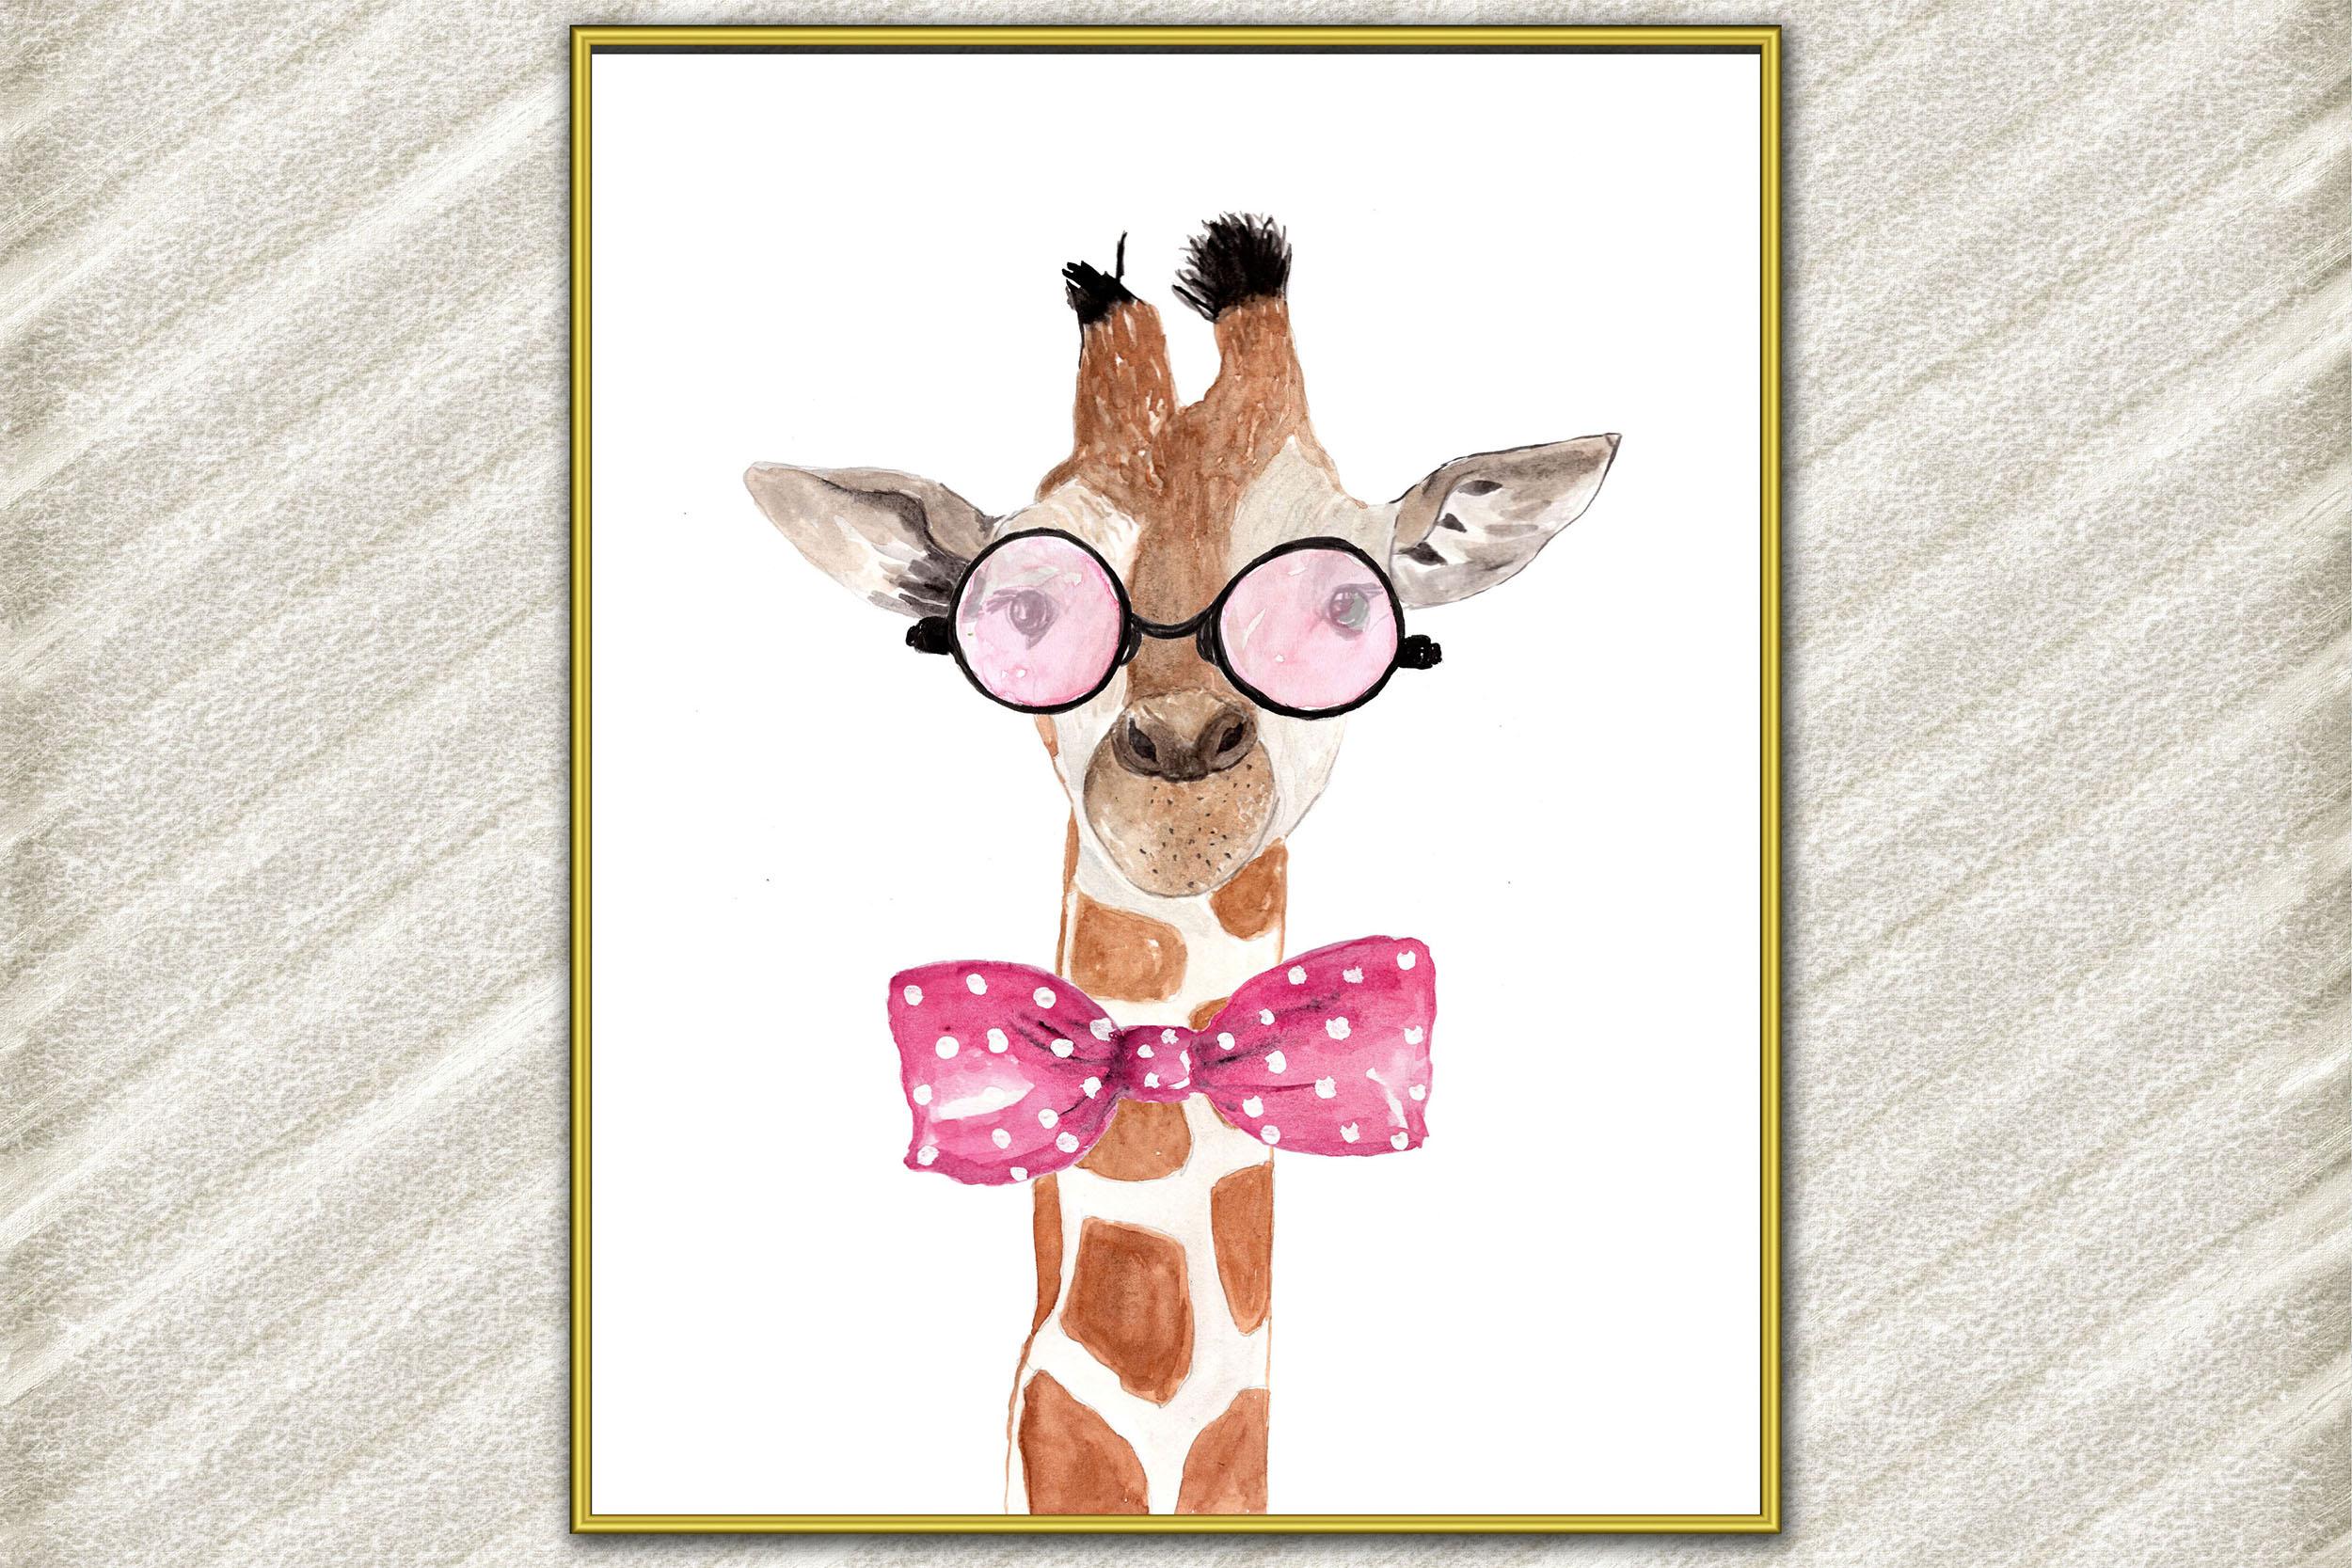 Giraffe Safari prints ,Funny animals,Giraffe with glasses example image 1